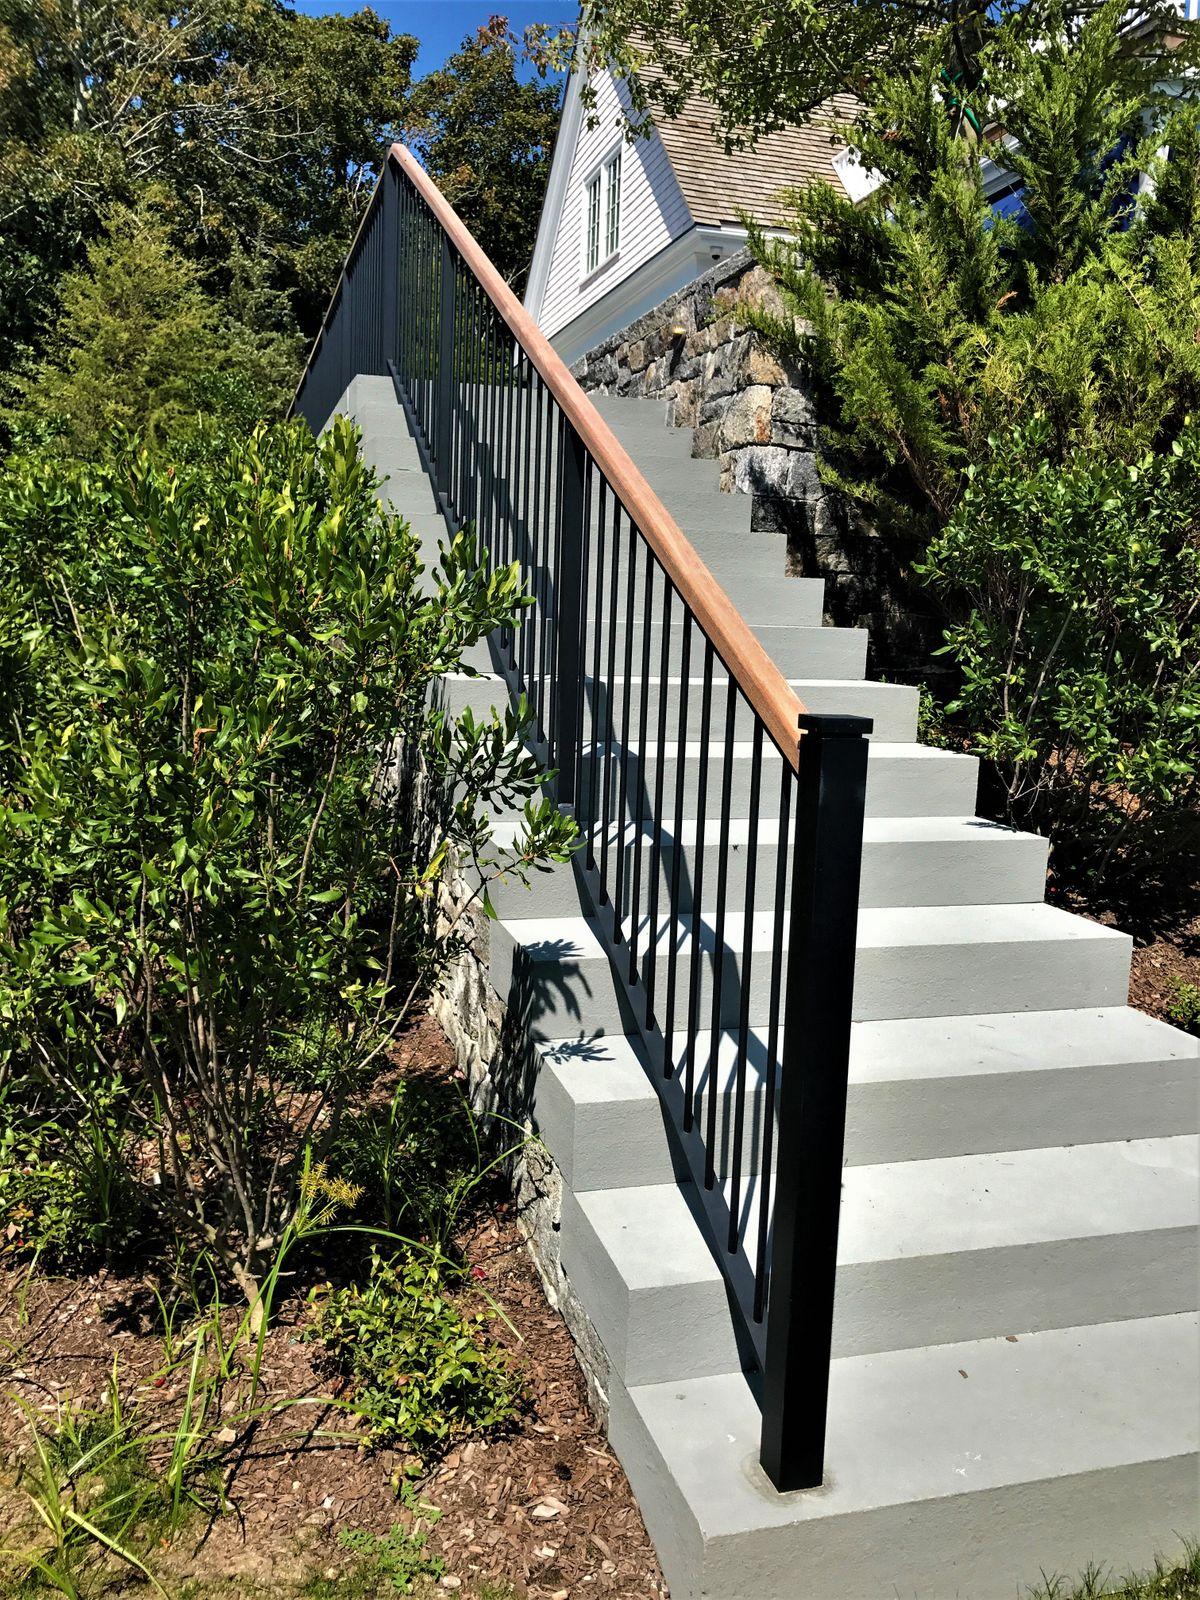 ANDLC-Stairs 1.jpg